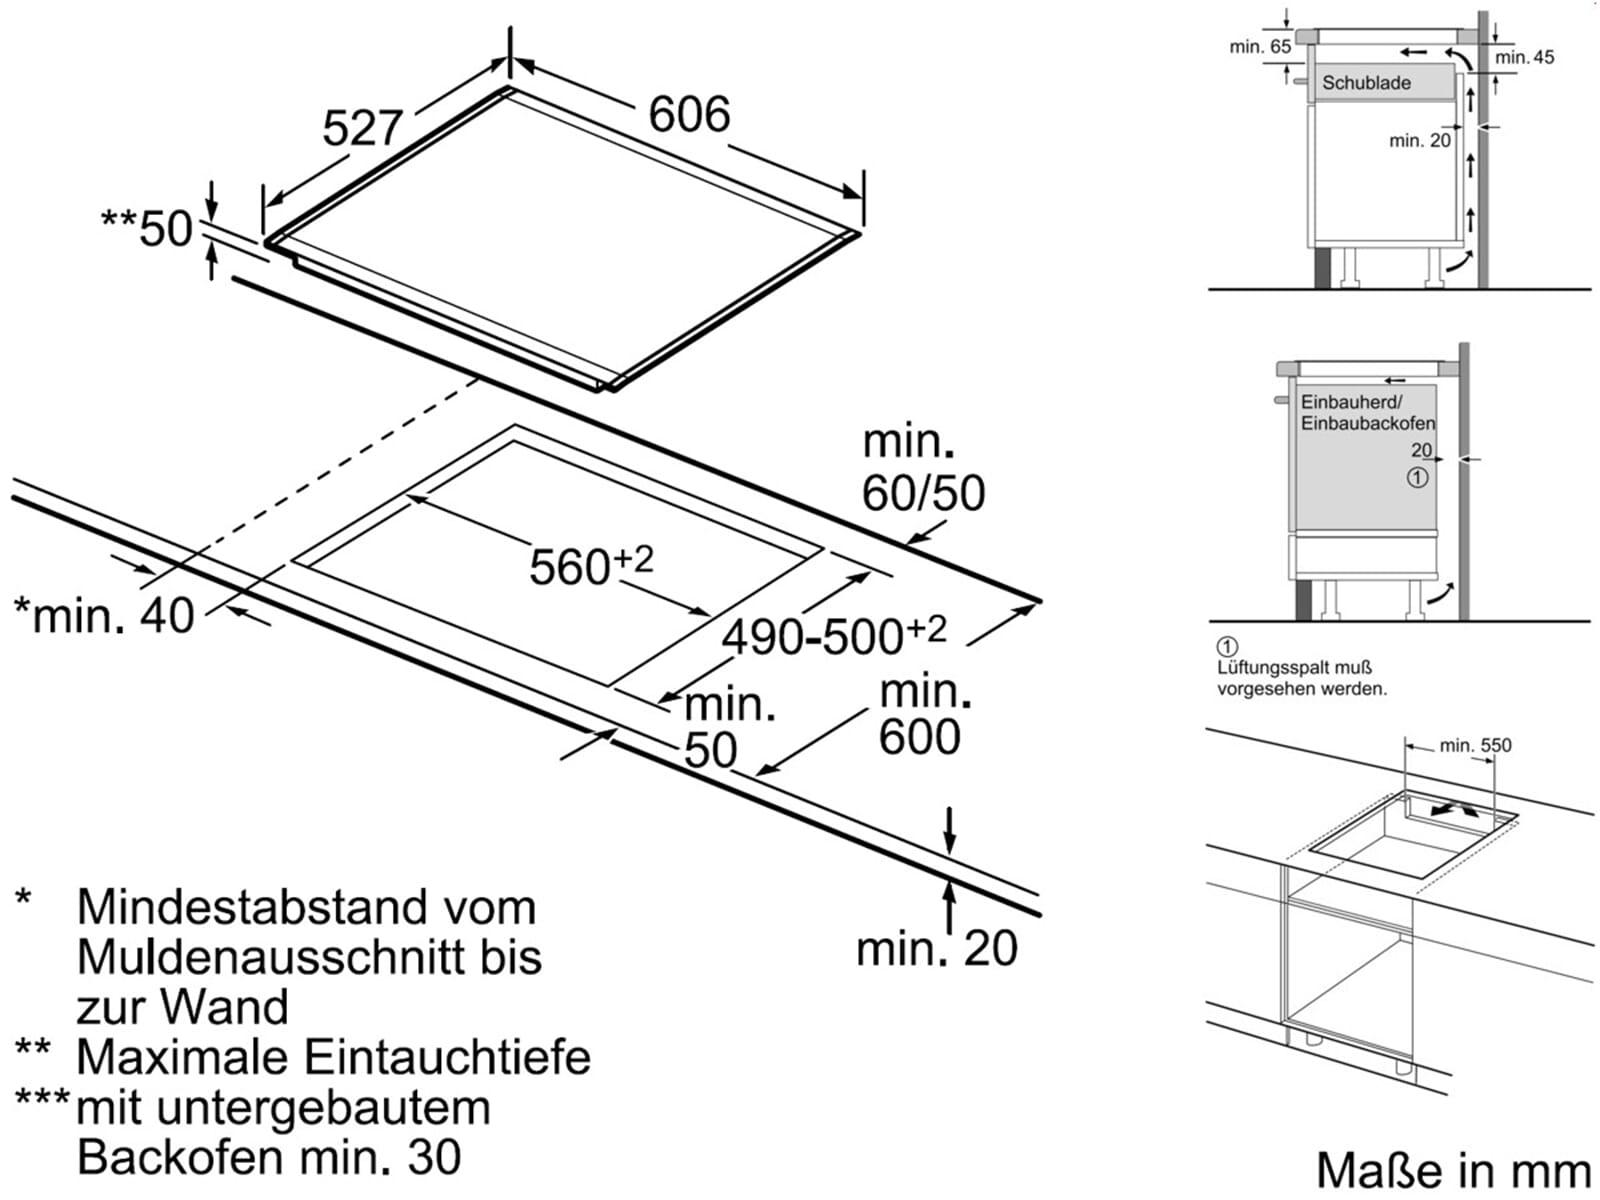 bosch pib673f17e induktion glaskeramik kochfeld autark f r 838 90 eur. Black Bedroom Furniture Sets. Home Design Ideas